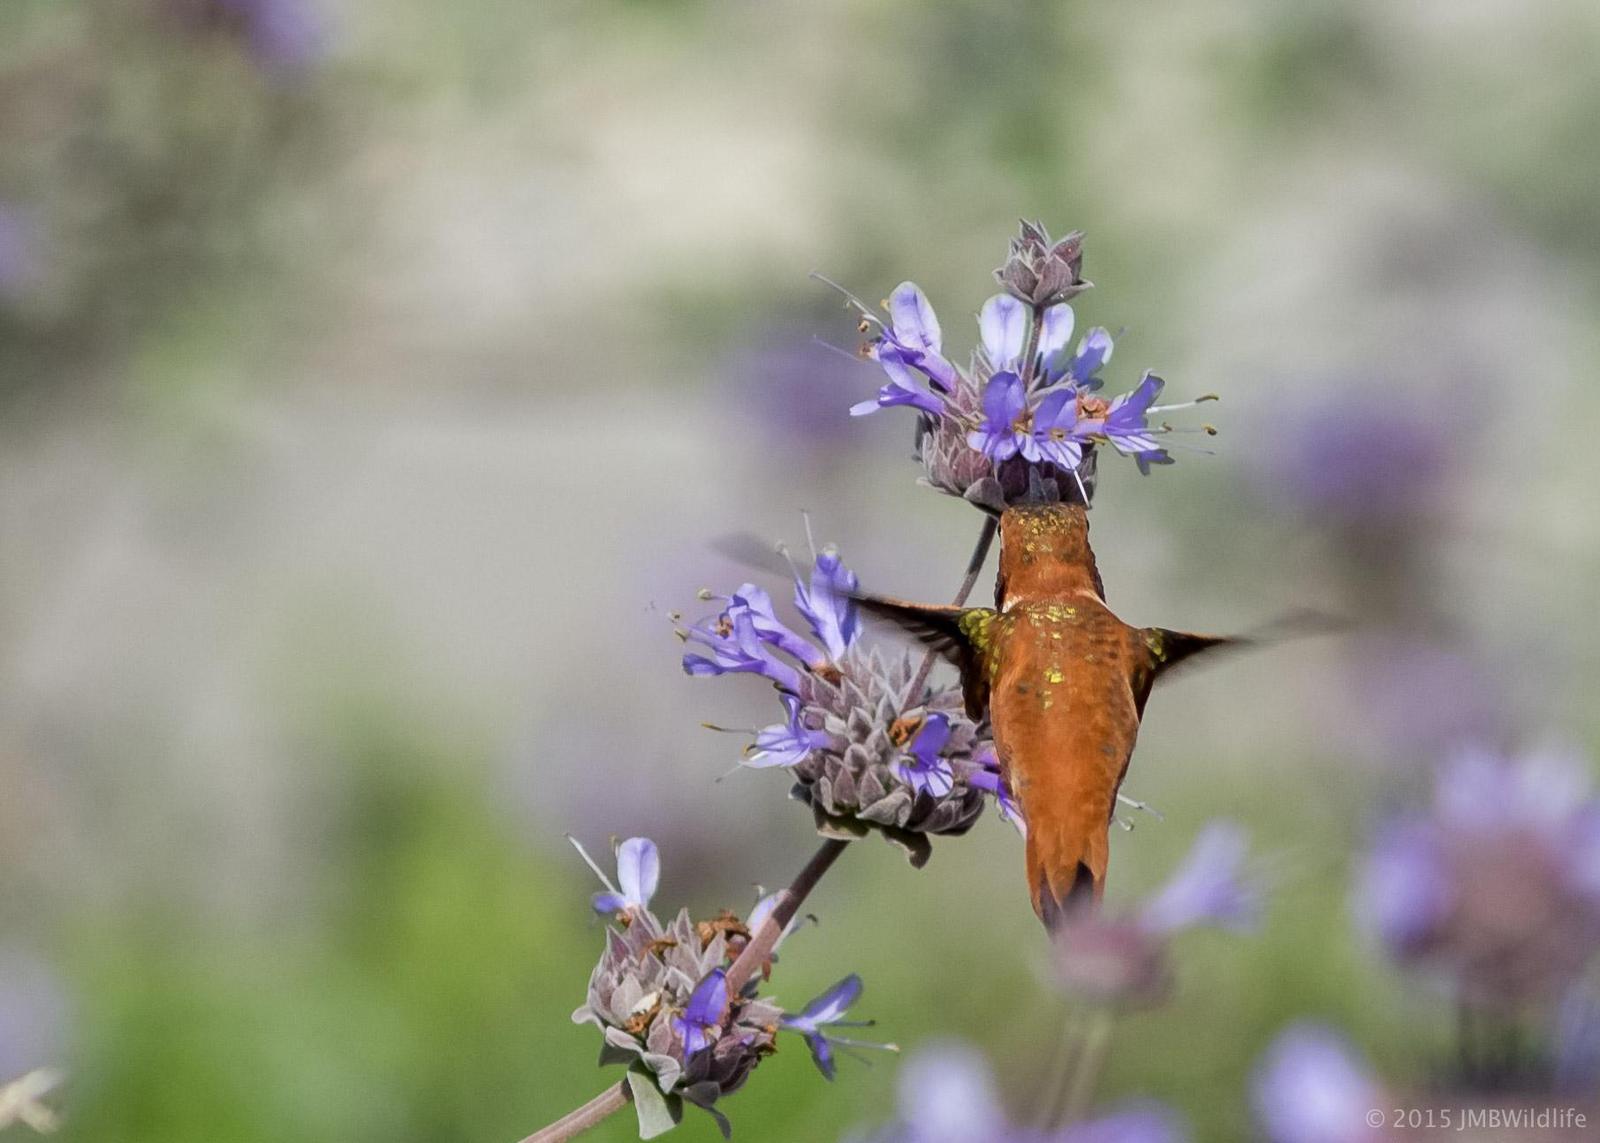 Rufous Hummingbird Photo by Jeff Bray